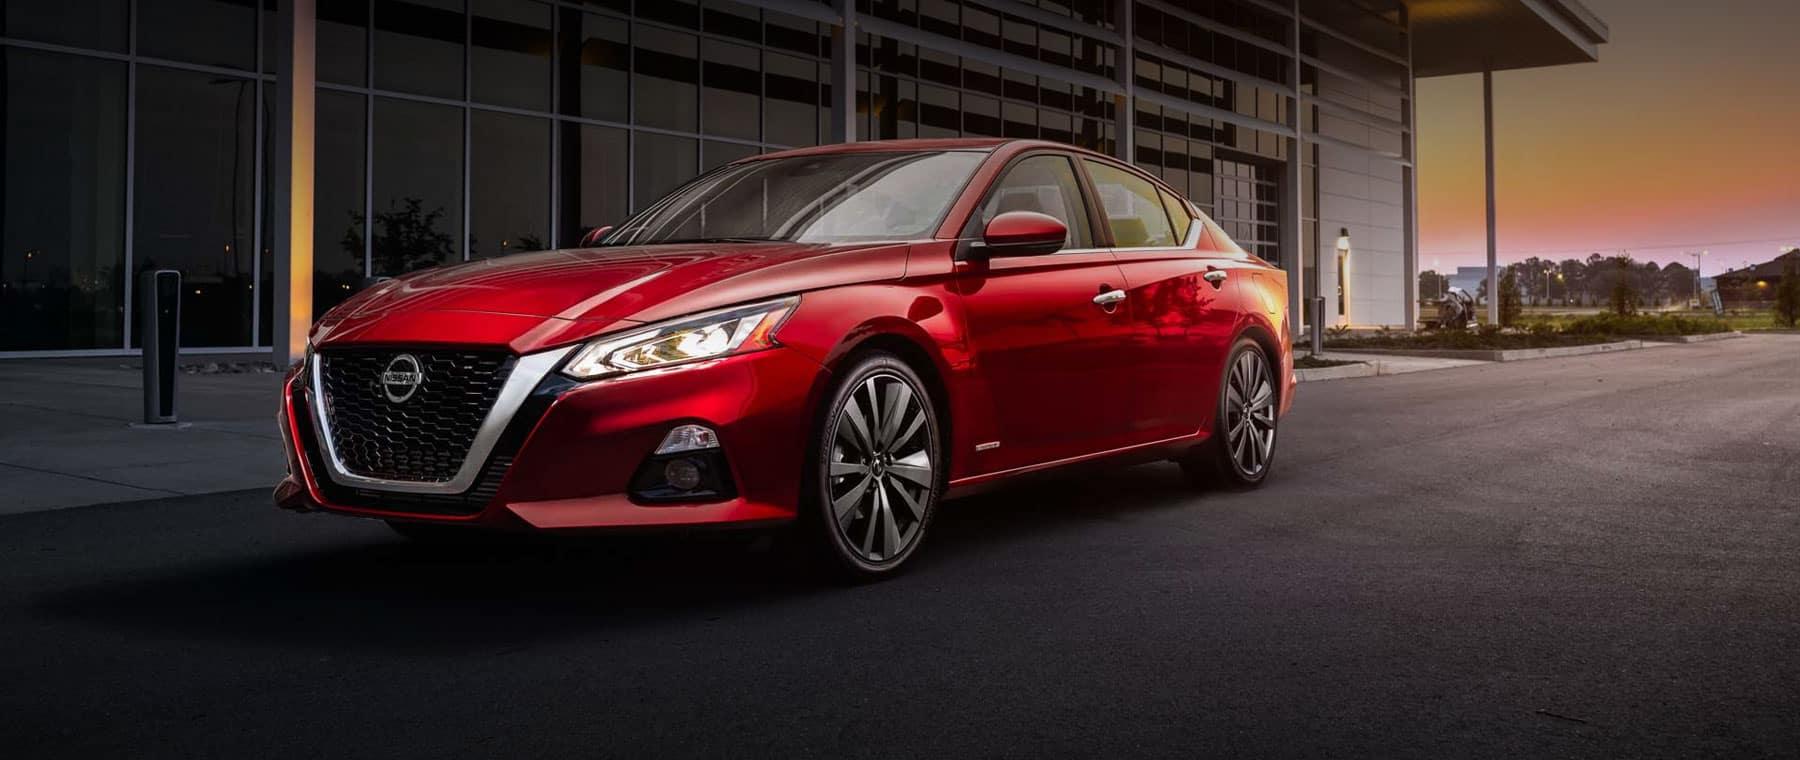 2020 Nissan Altima®